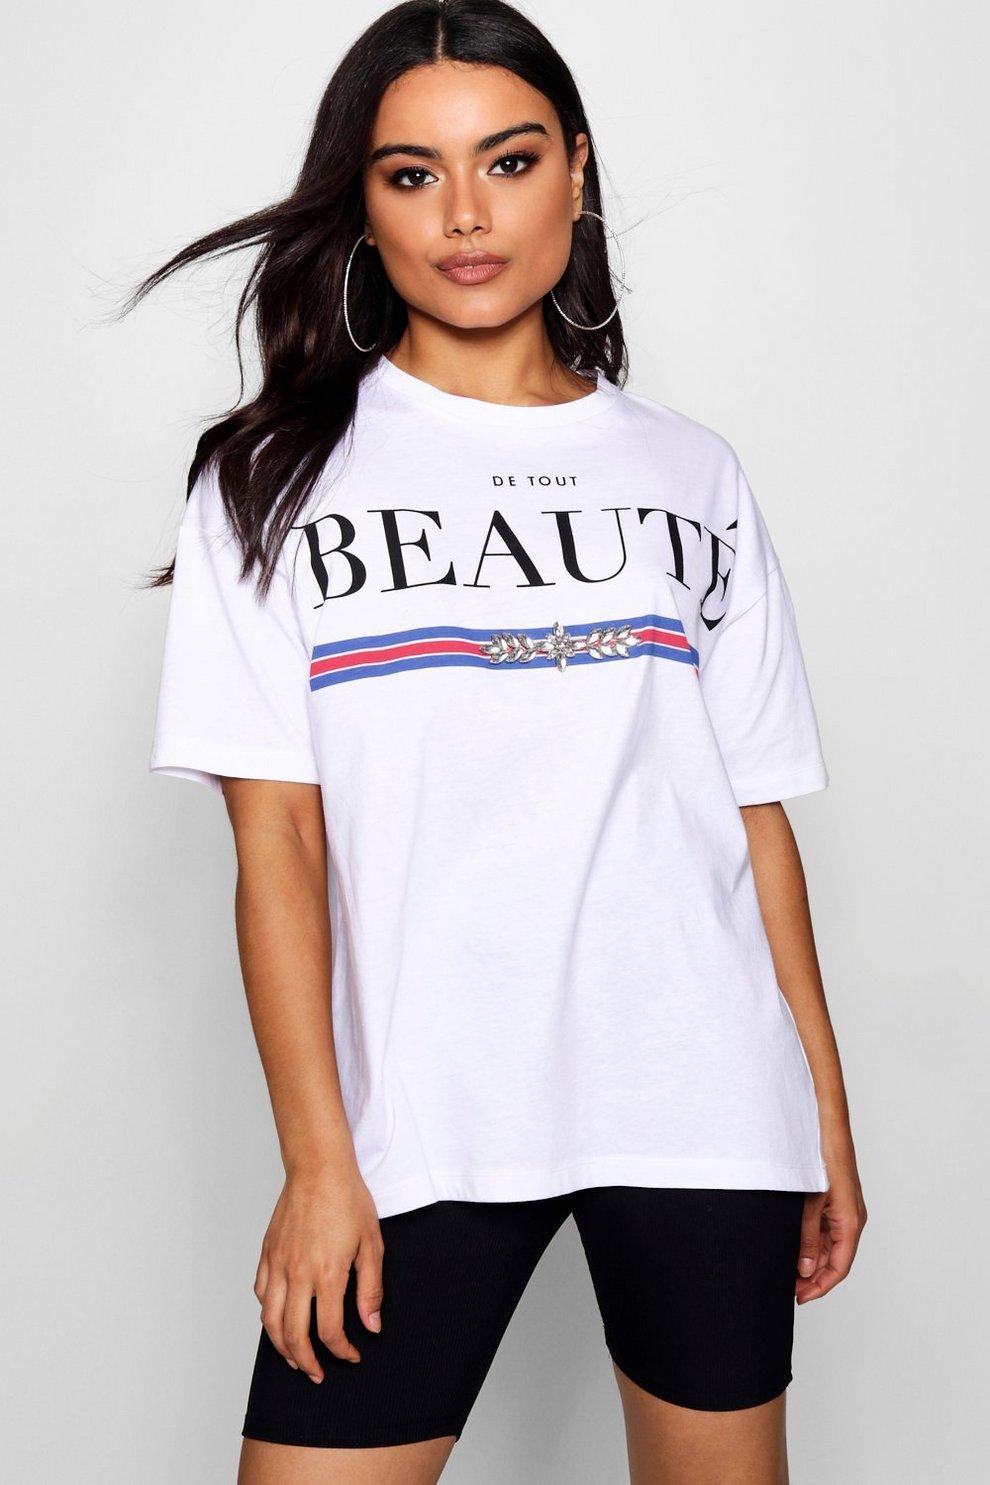 Boohoo Beaute Diamonte Slogan Tee Outlet Discounts LAZy3CB